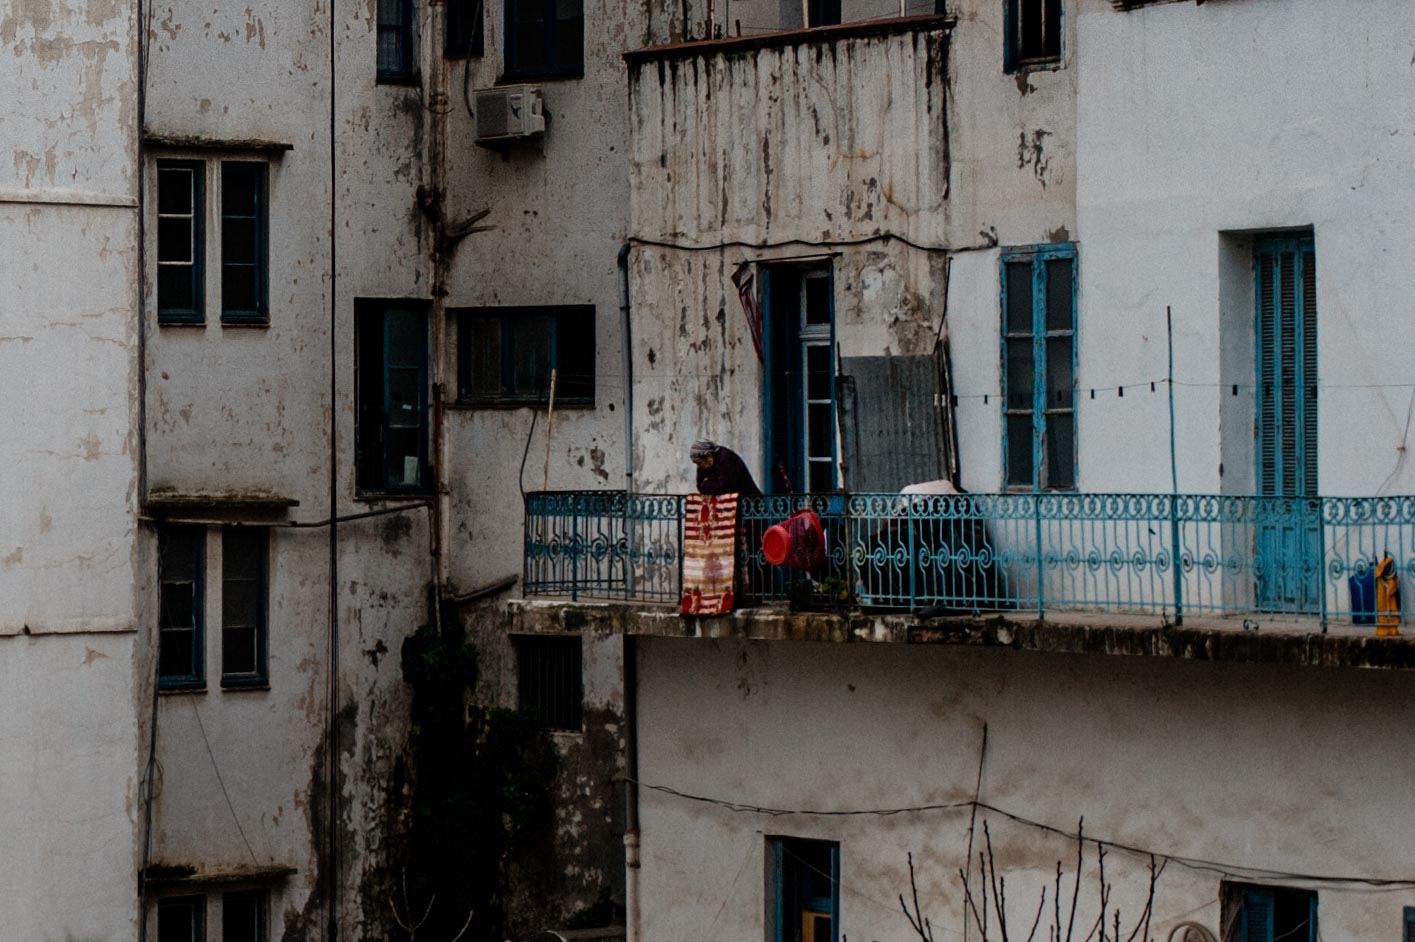 Femme âgée sur son balcon | Cadix, Alger 2017 - Old woman from her balcony | Cadix, Algiers 2017